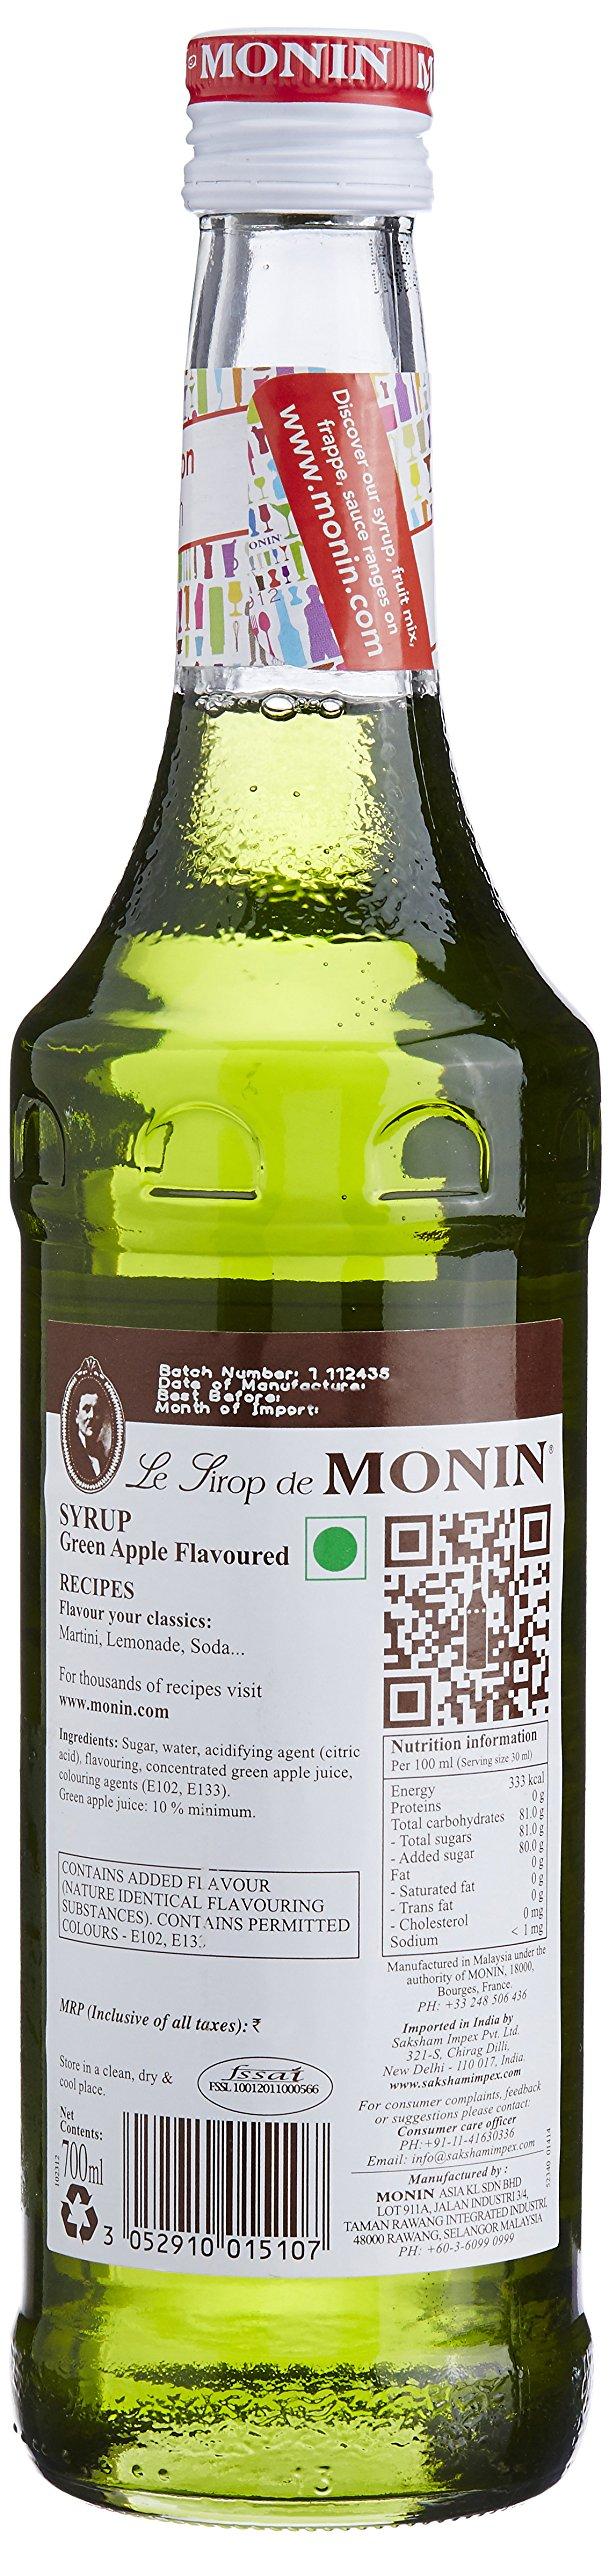 Monin-Premium-Green-Apple-Syrup-700-ml